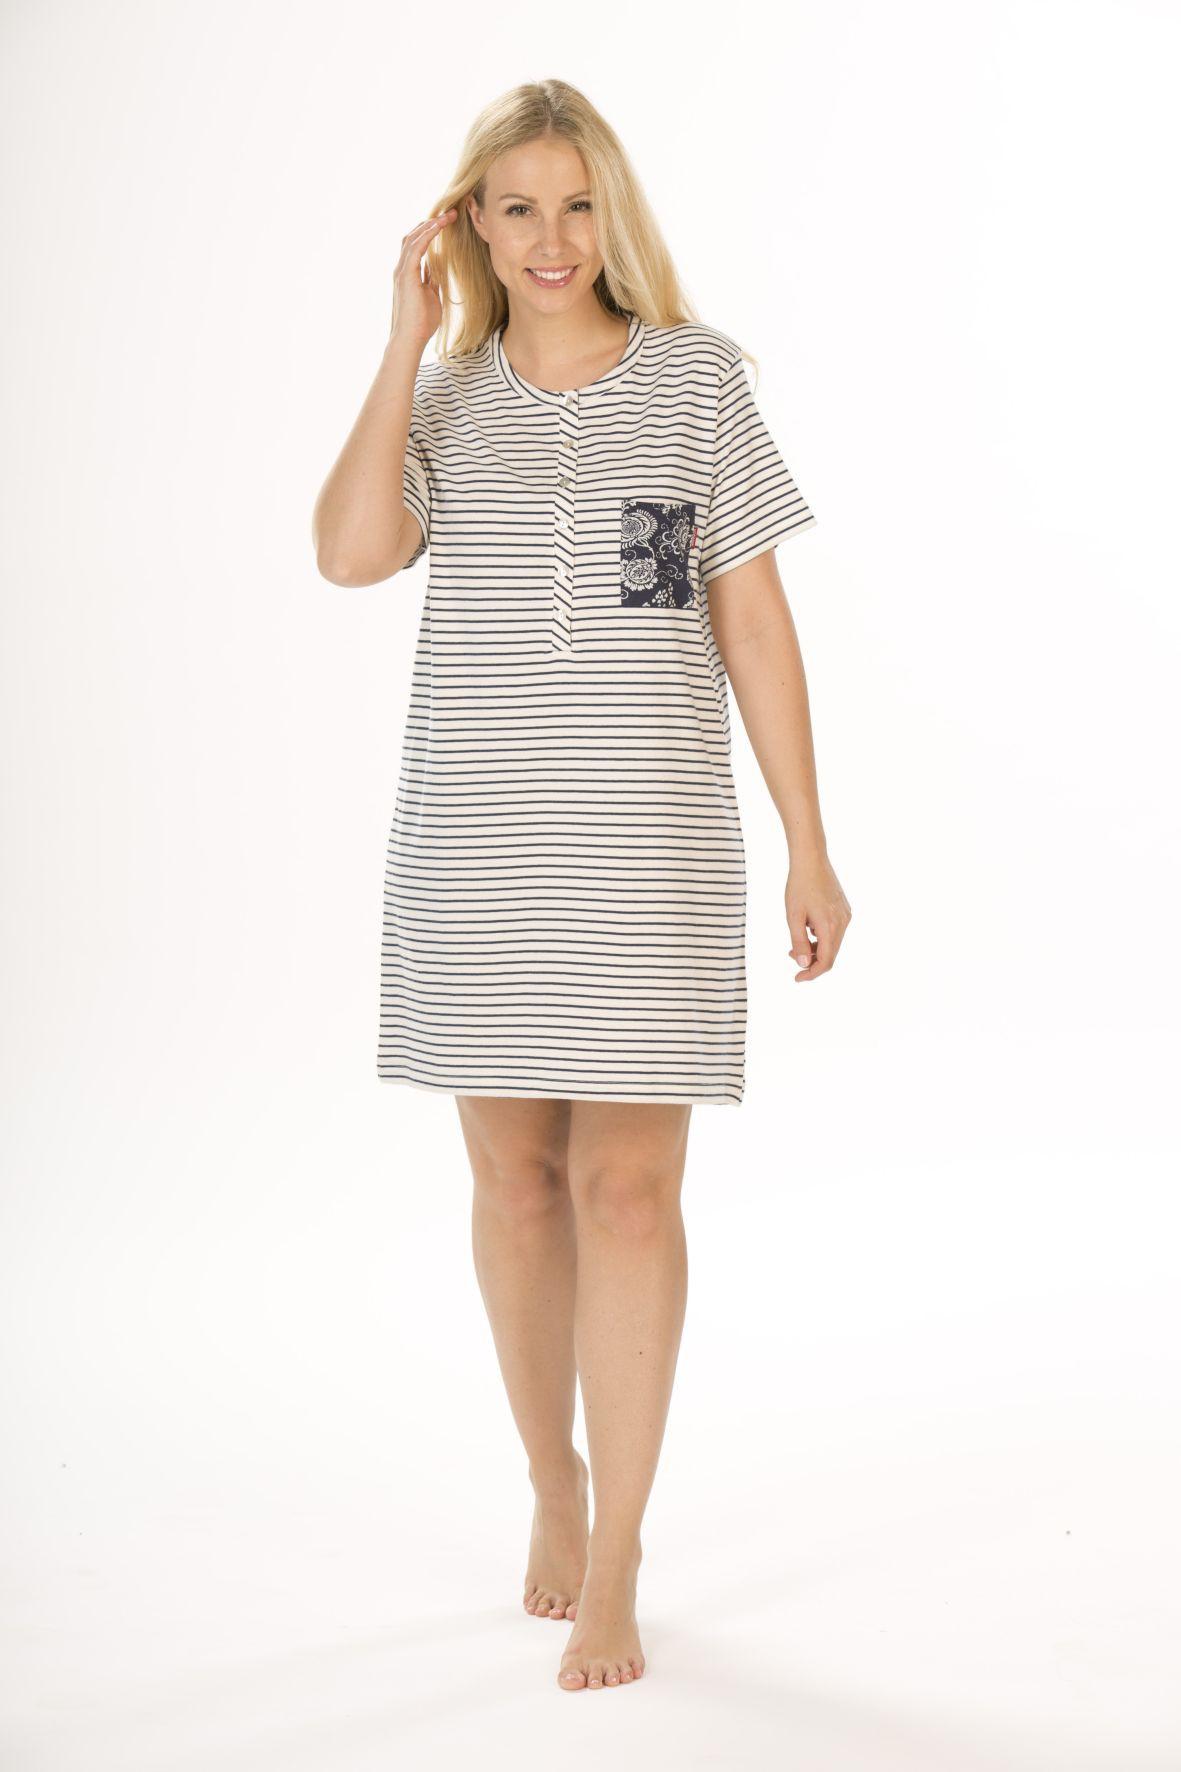 Damen Kurznachthemd, Bigshirt, 95 cm Länge, kurzarm,  151 213 90 752 001